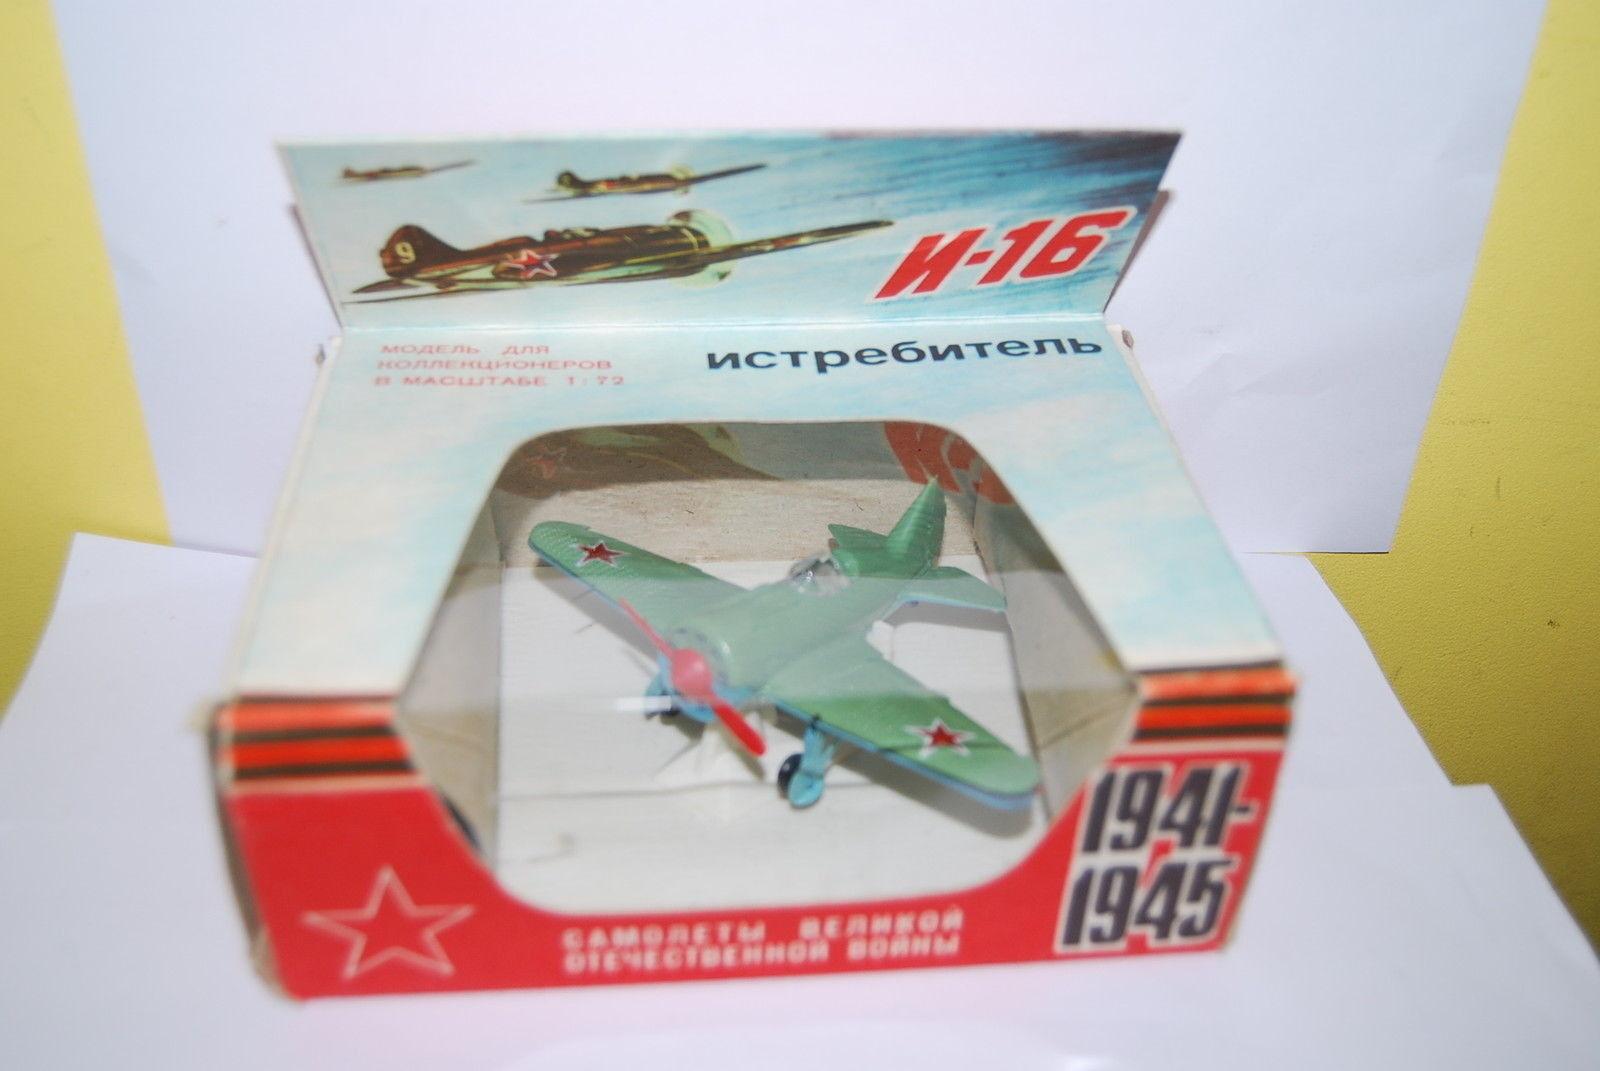 AVION RUSSE N16 VERT GUERRE 1941 1945  NEUF NEUF NEUF BOITE SCALE 1 72 5cf5ea